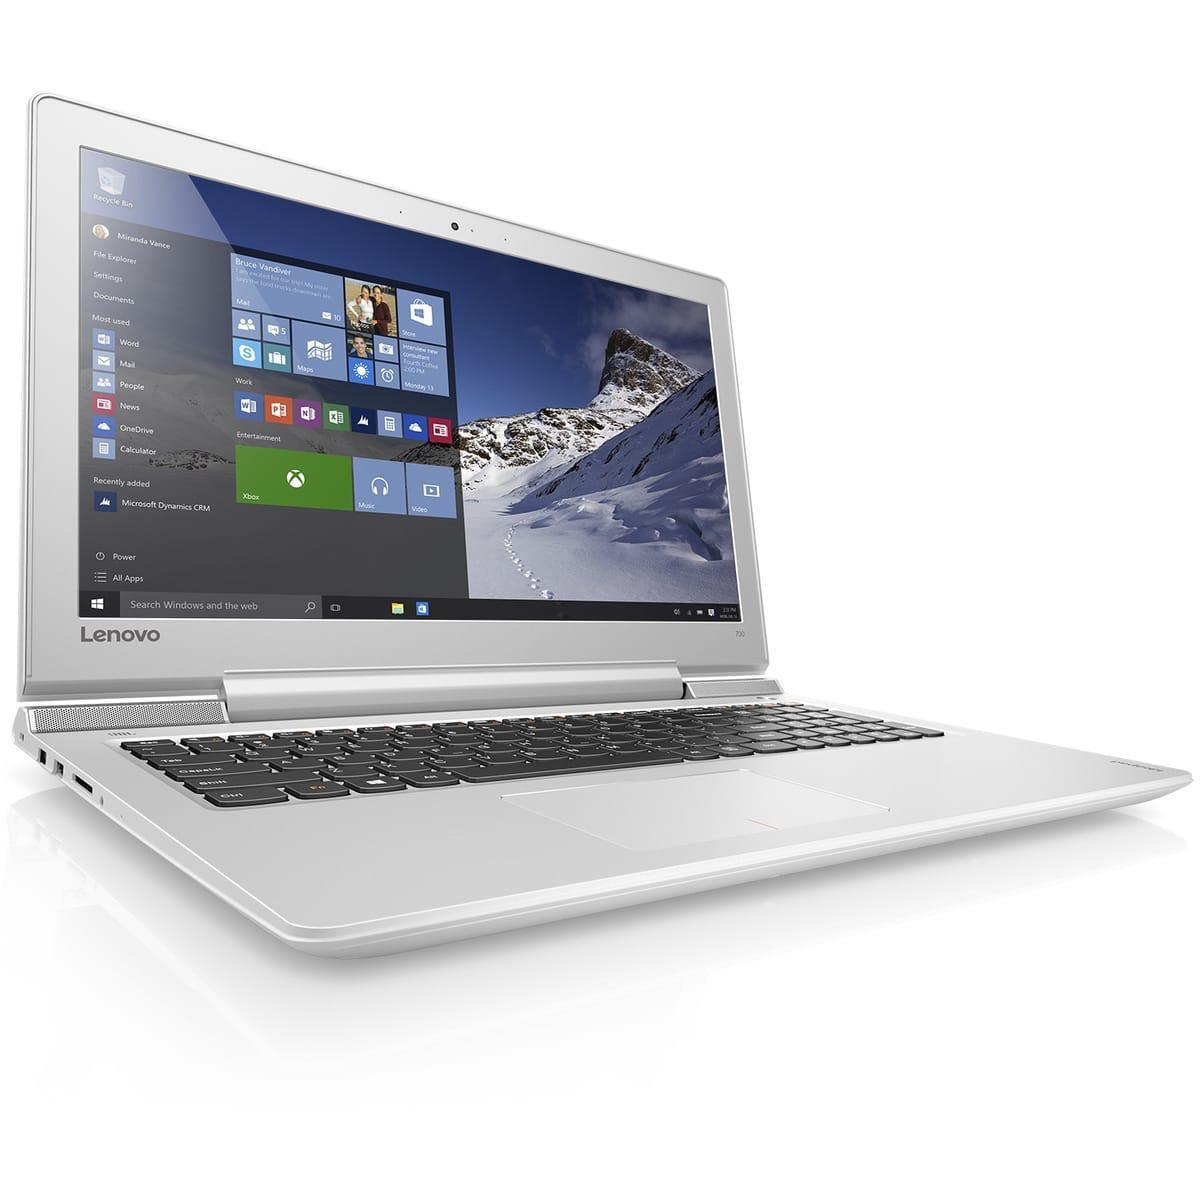 "PC portable 15.6"" Lenovo IdeaPad 700-15ISK-FFR (i5-6300HQ, GTX 950M, 8 Go de Ram, 1 To)"